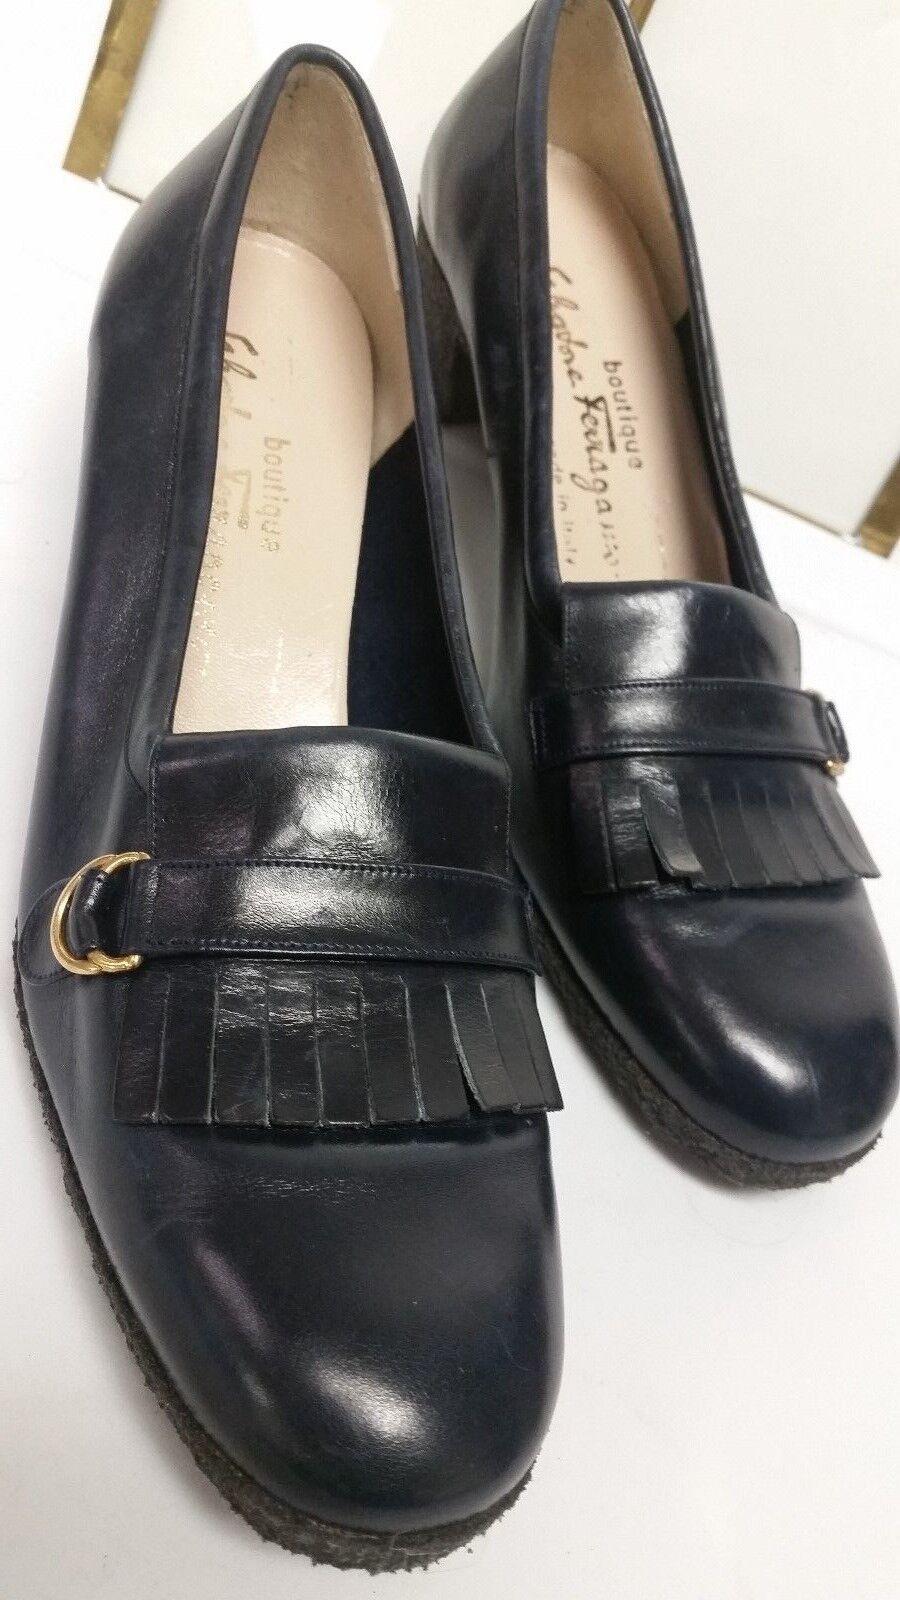 Womens SALVATORE FERRAGAMO Classic Patent bluee Leather Pump shoes shoes shoes Size 8.5AA 2485f1